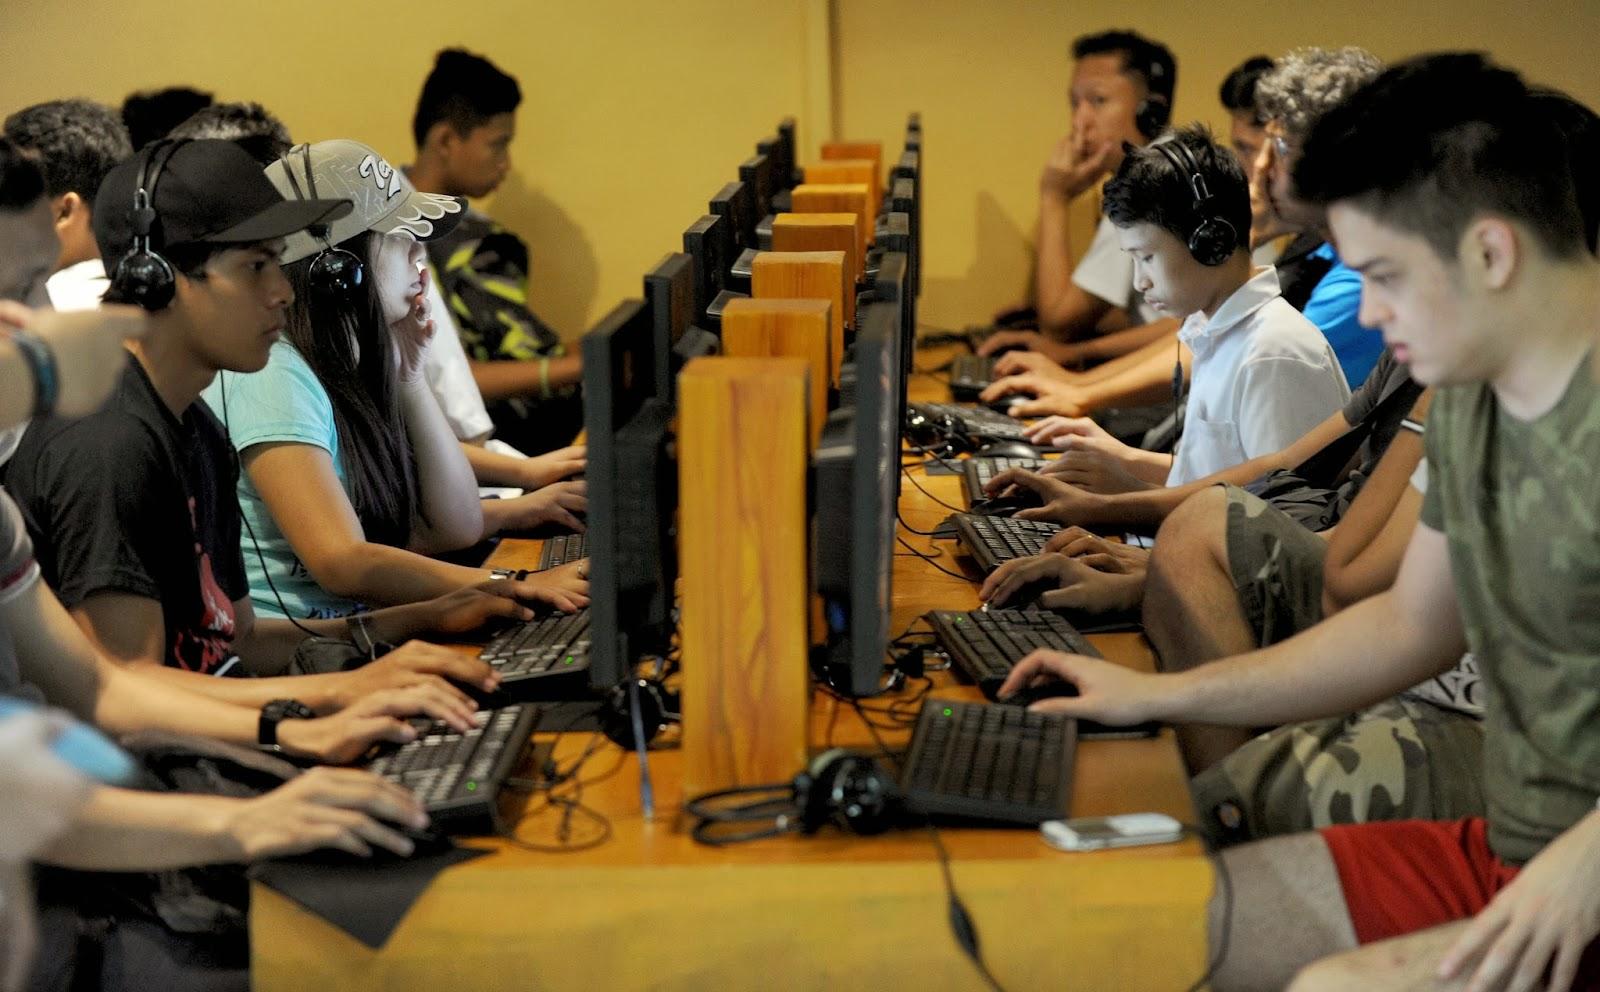 Asia, Crime, Cybercrime, Cybersex, Industry, Internet, Internet cafe, Internet Porn, Law, Manila, News, Operation, Philippine, Police, Rule, School, Supreme Court,